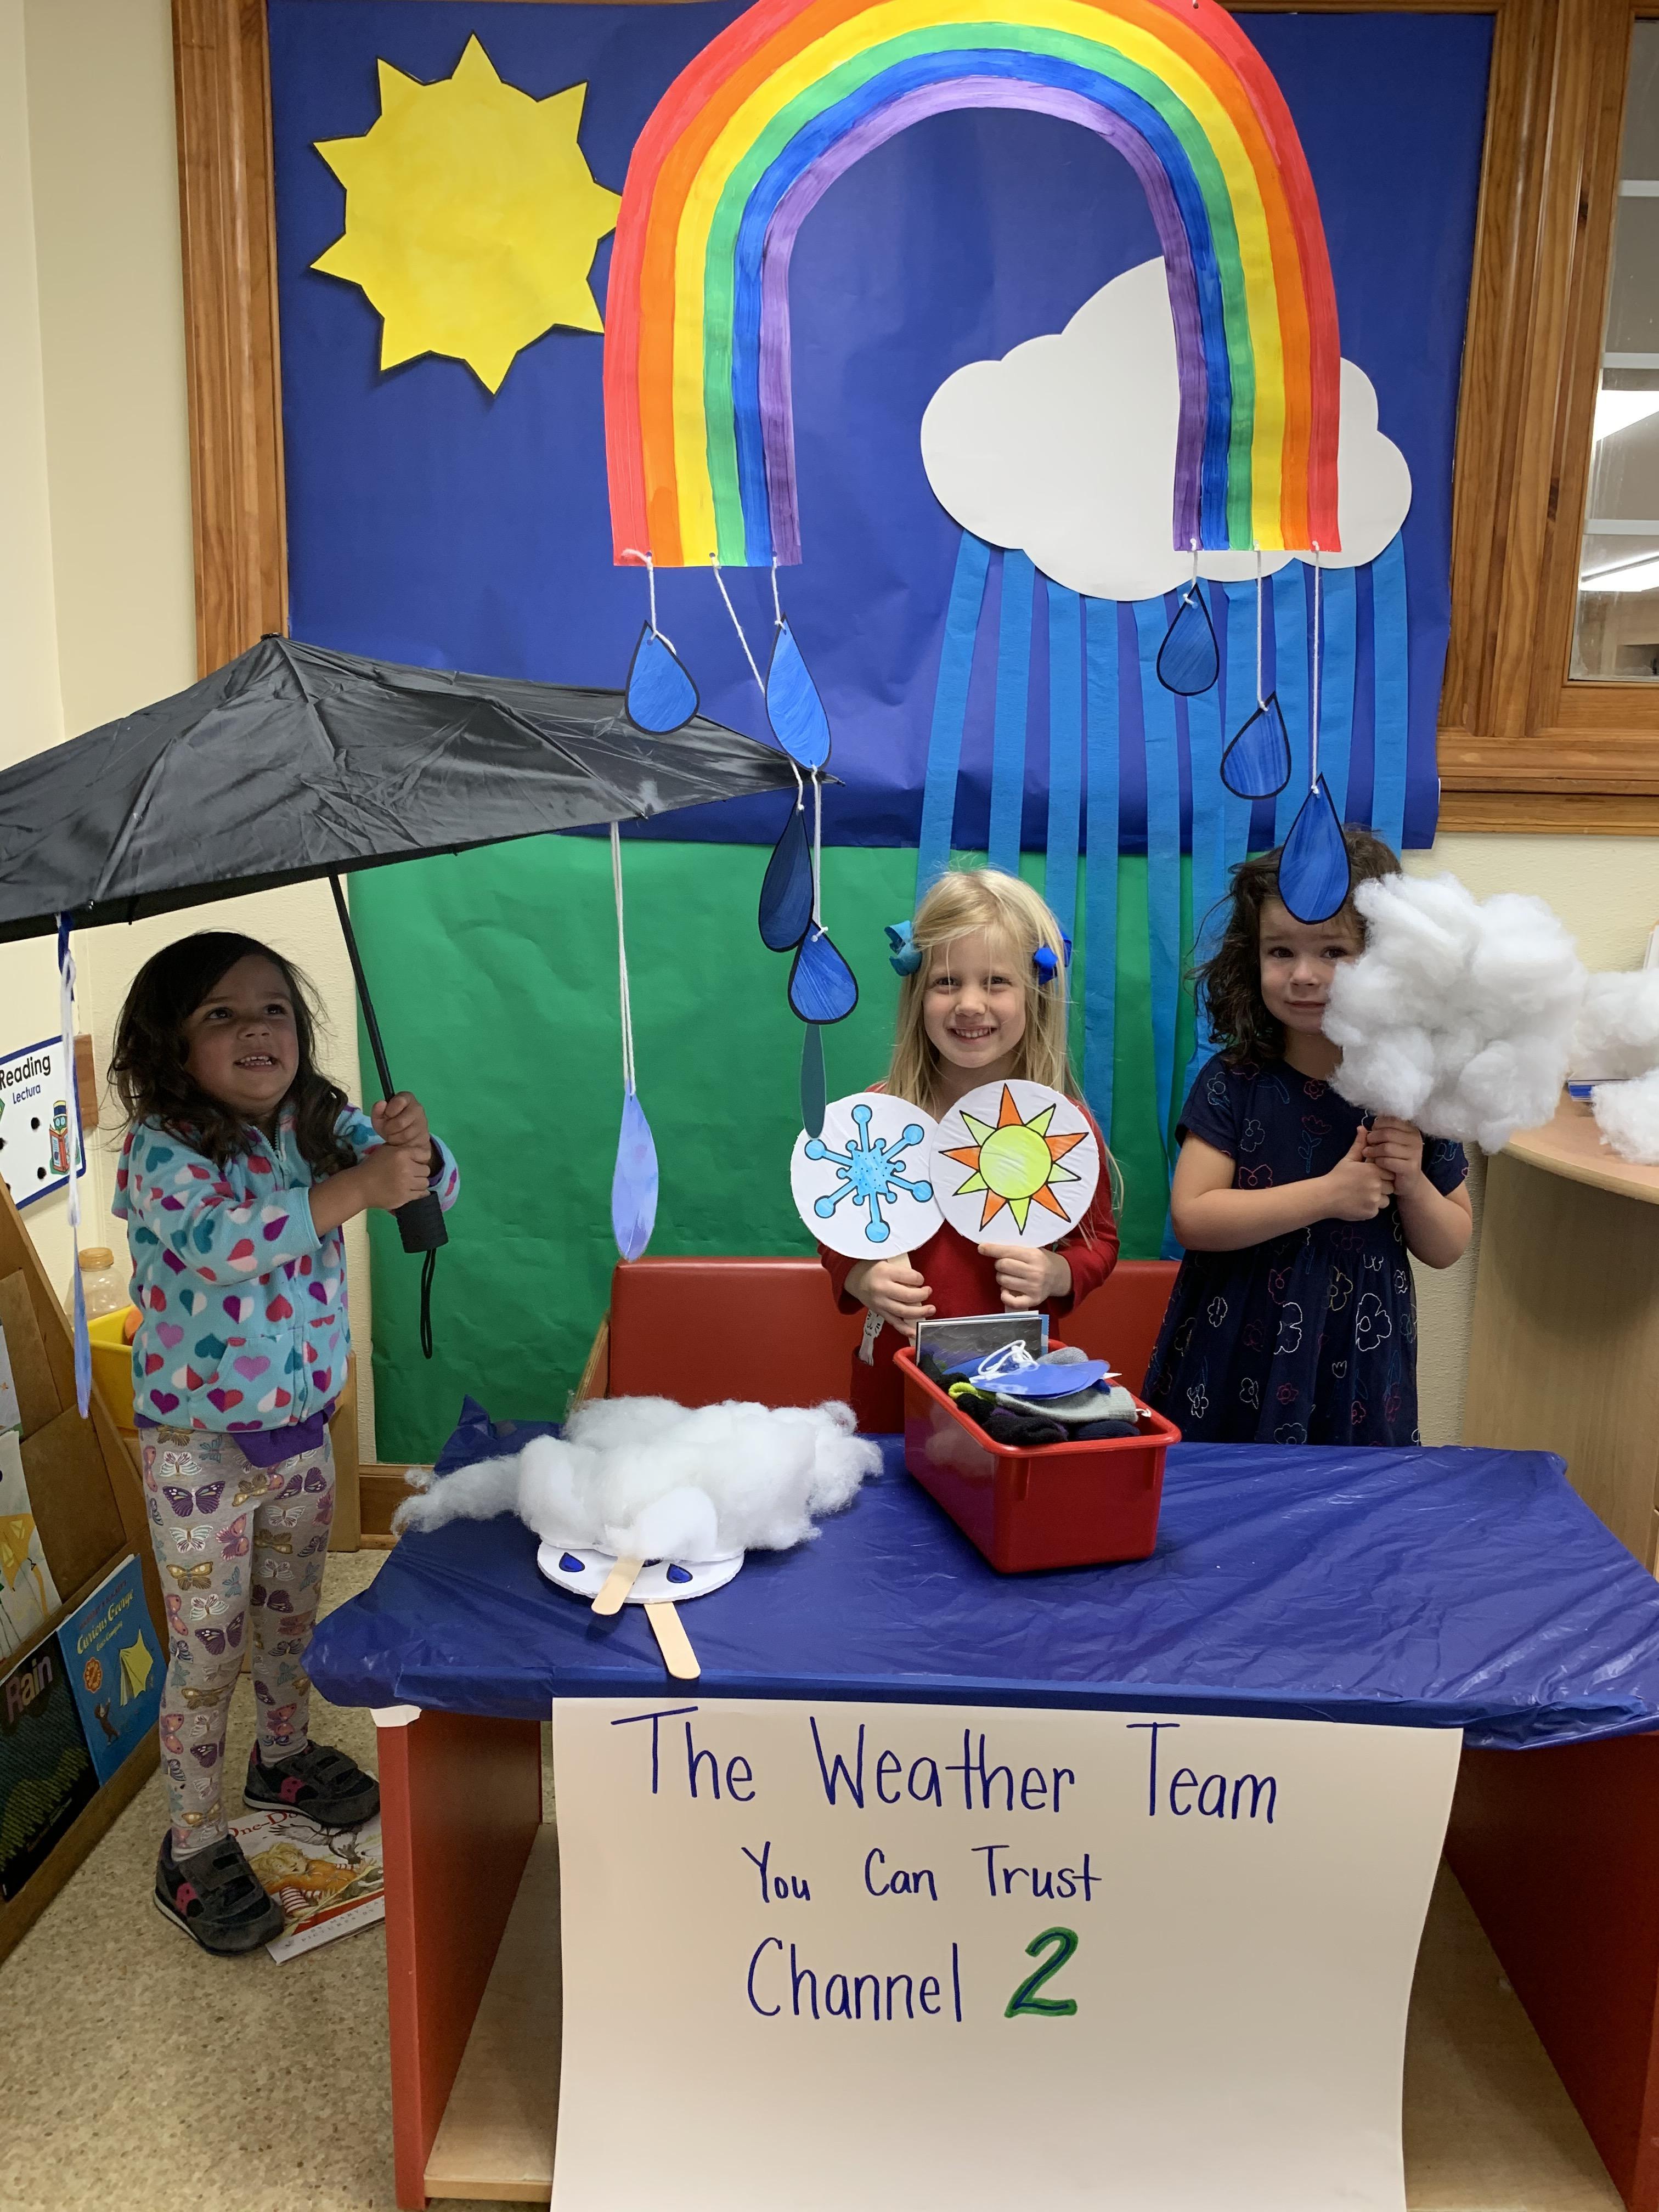 Little Girls holding umbrellas